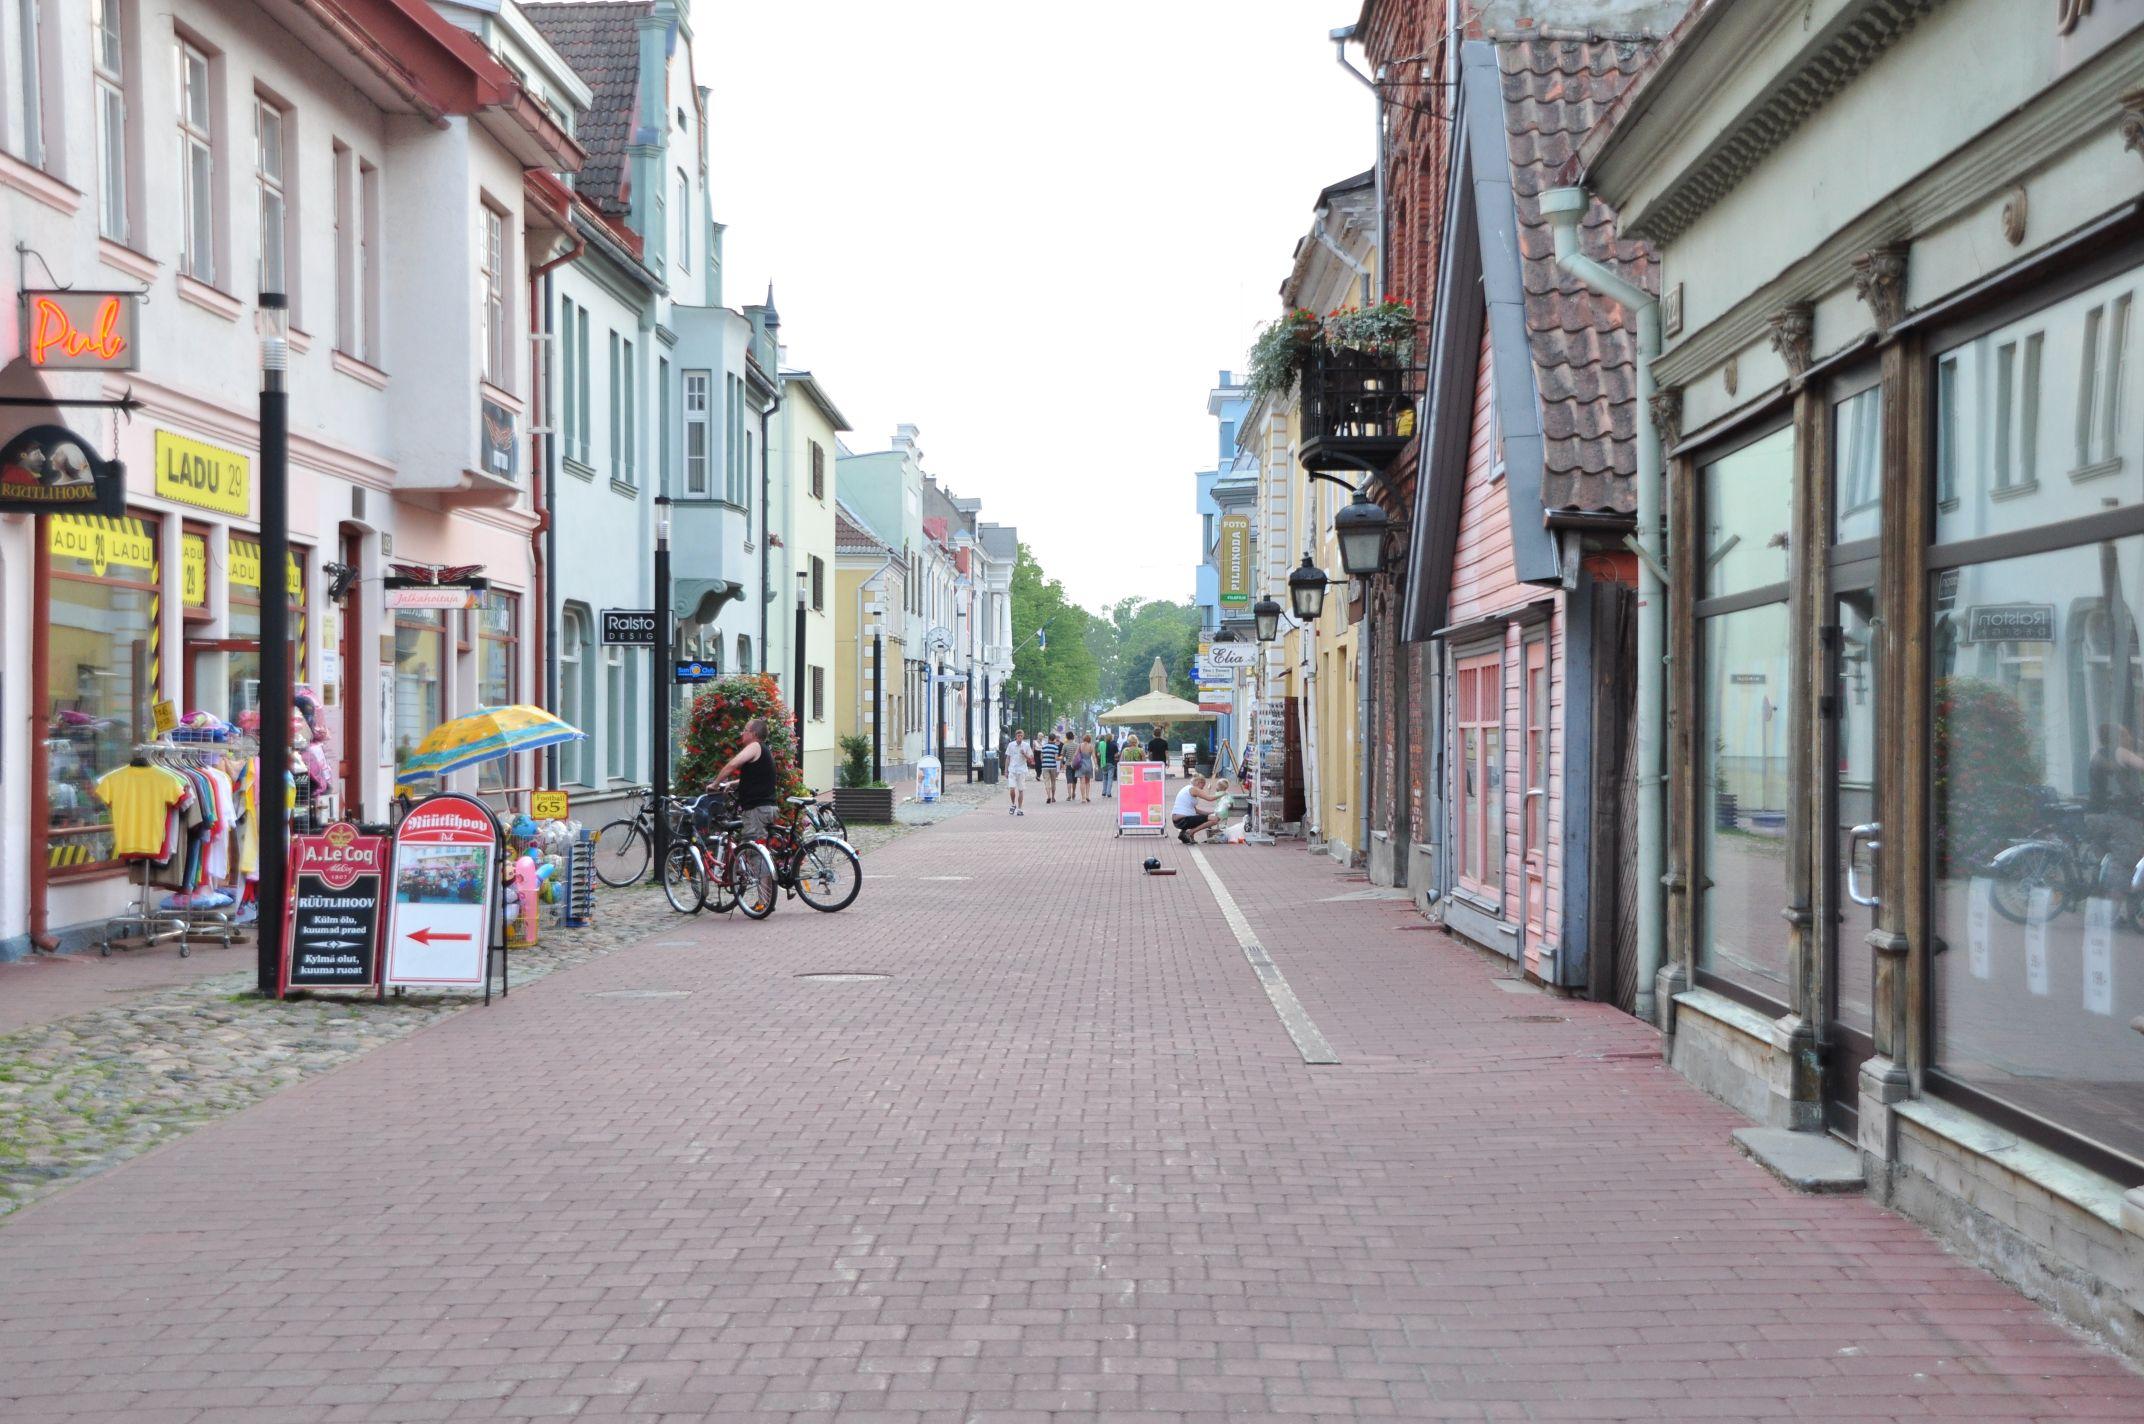 Fußgängerzone in Pärnu